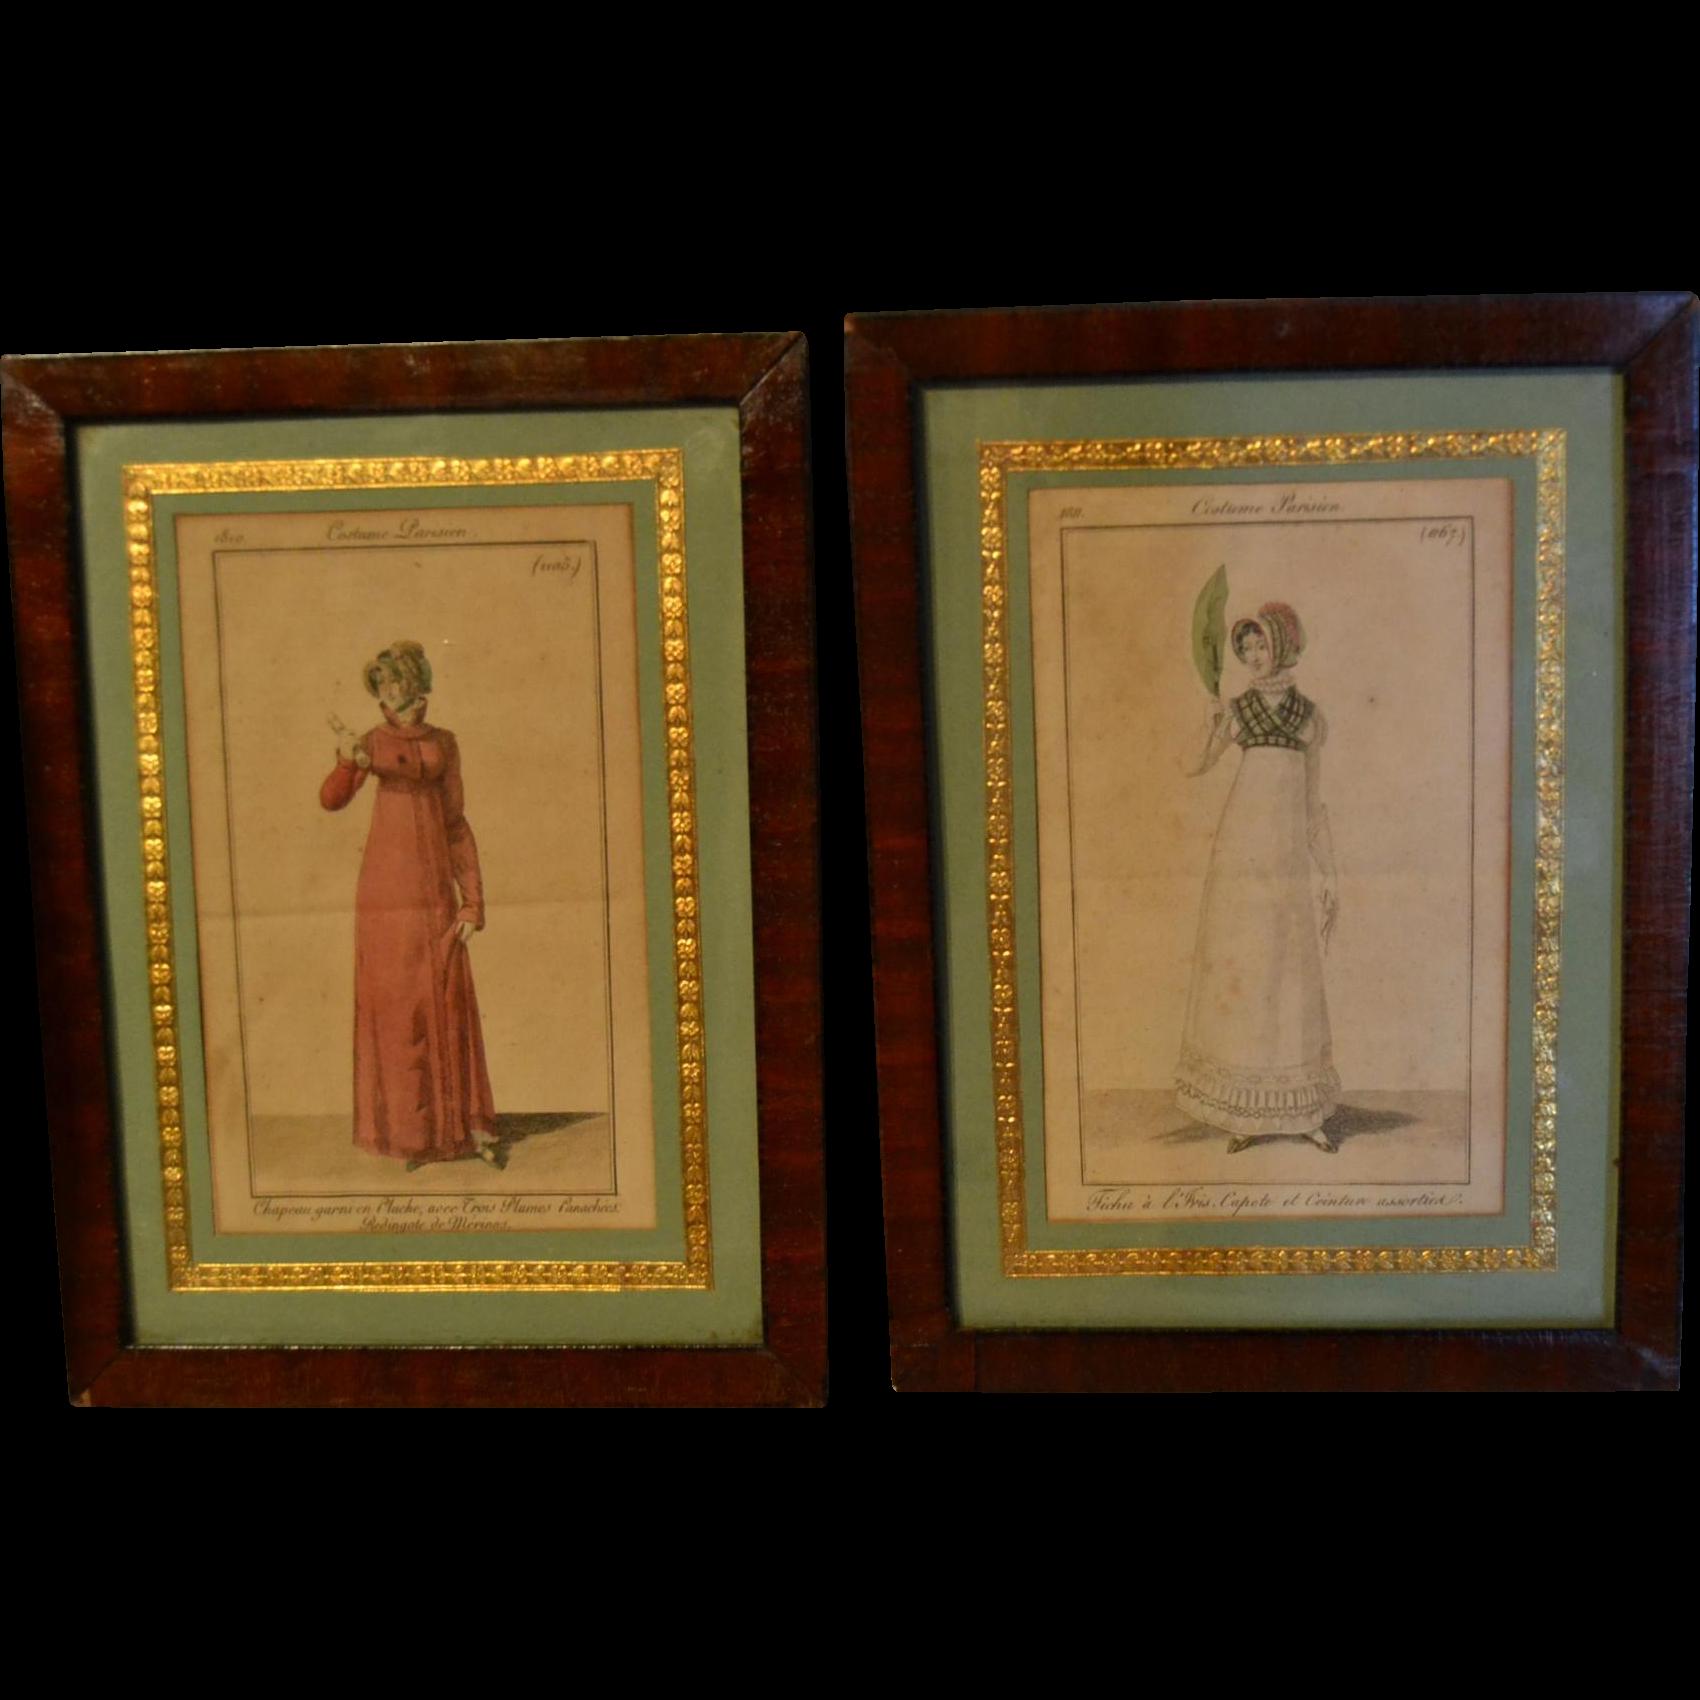 Delicious pair of French fashion engraving Circa 1810/1811